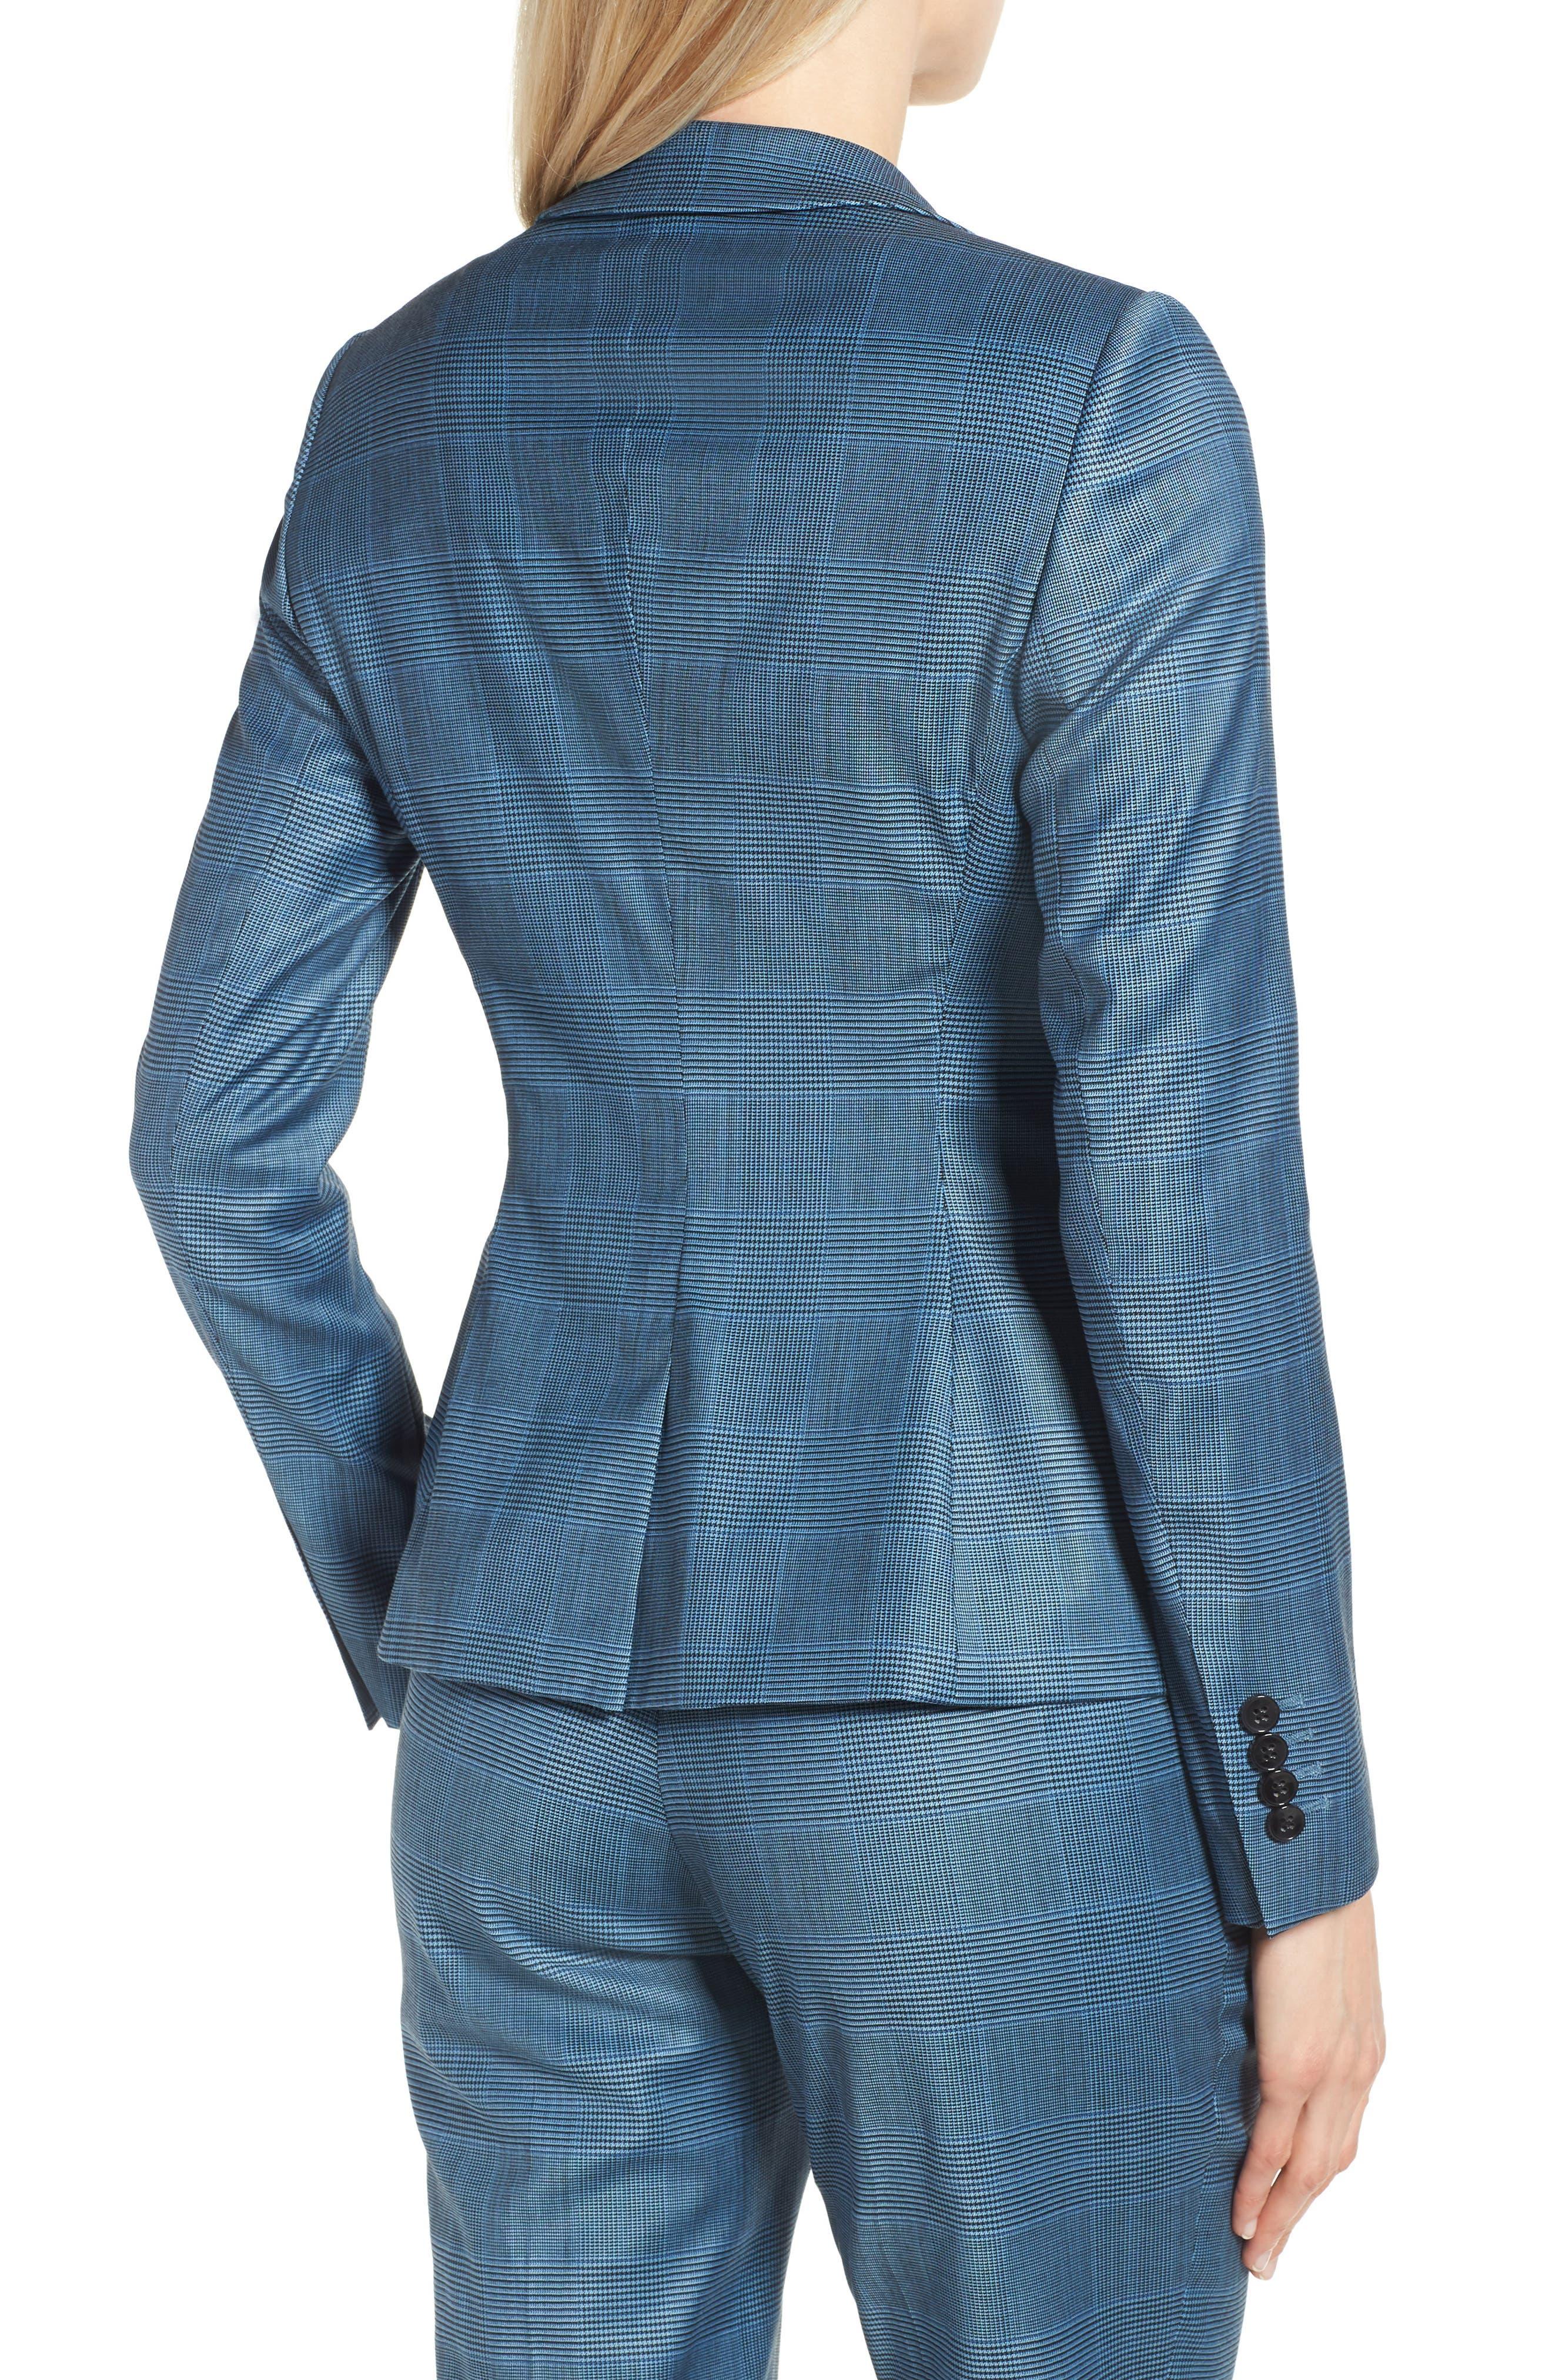 Jelaya Glencheck Double Breasted Suit Jacket,                             Alternate thumbnail 2, color,                             467